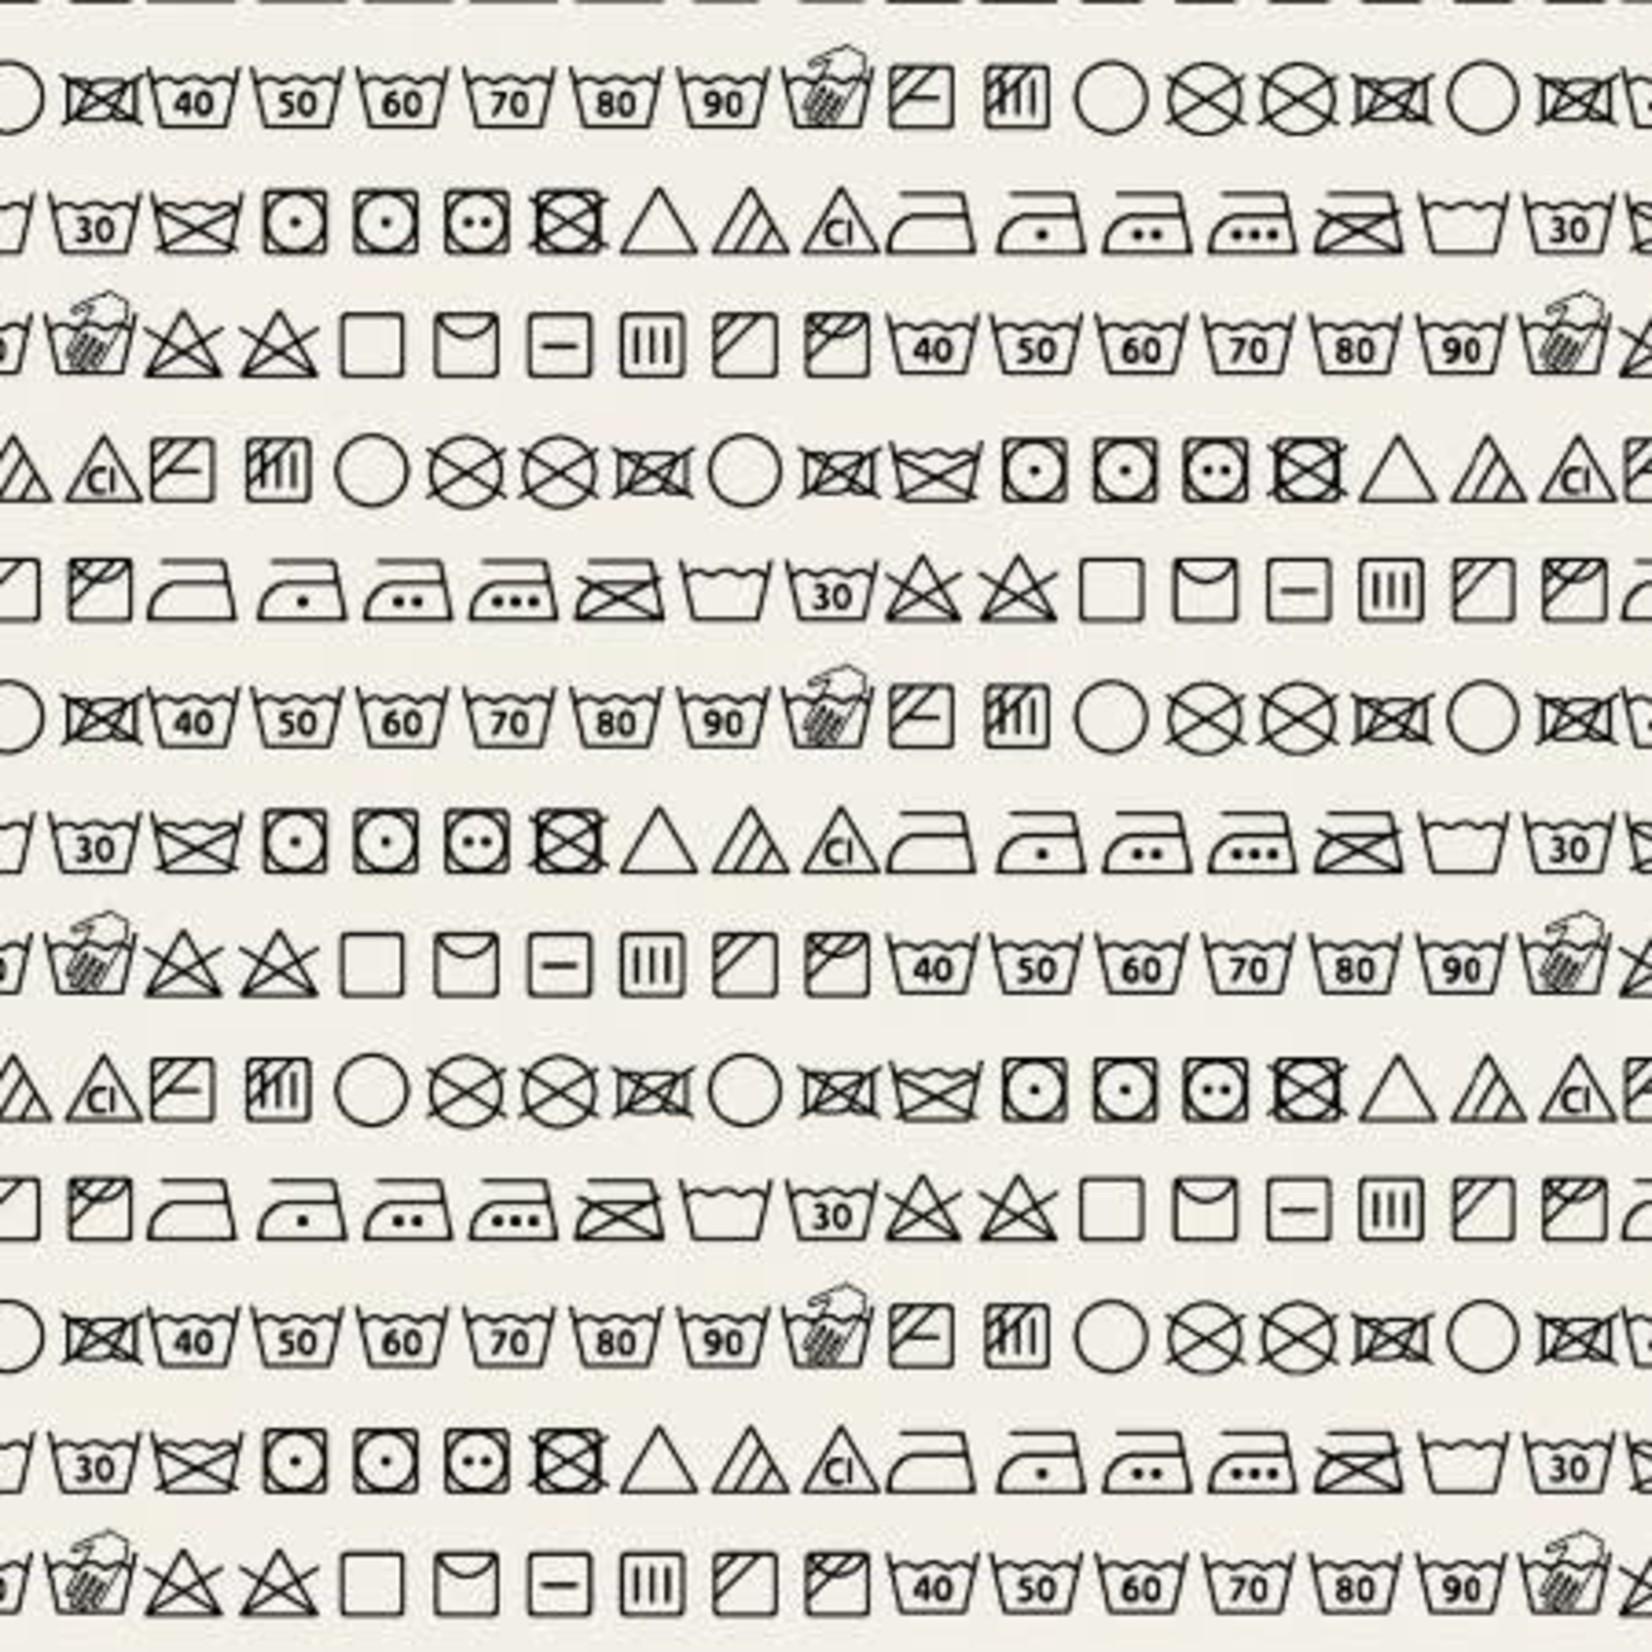 Studio E Fabrics Loads of Fun - Care Symbols - Black